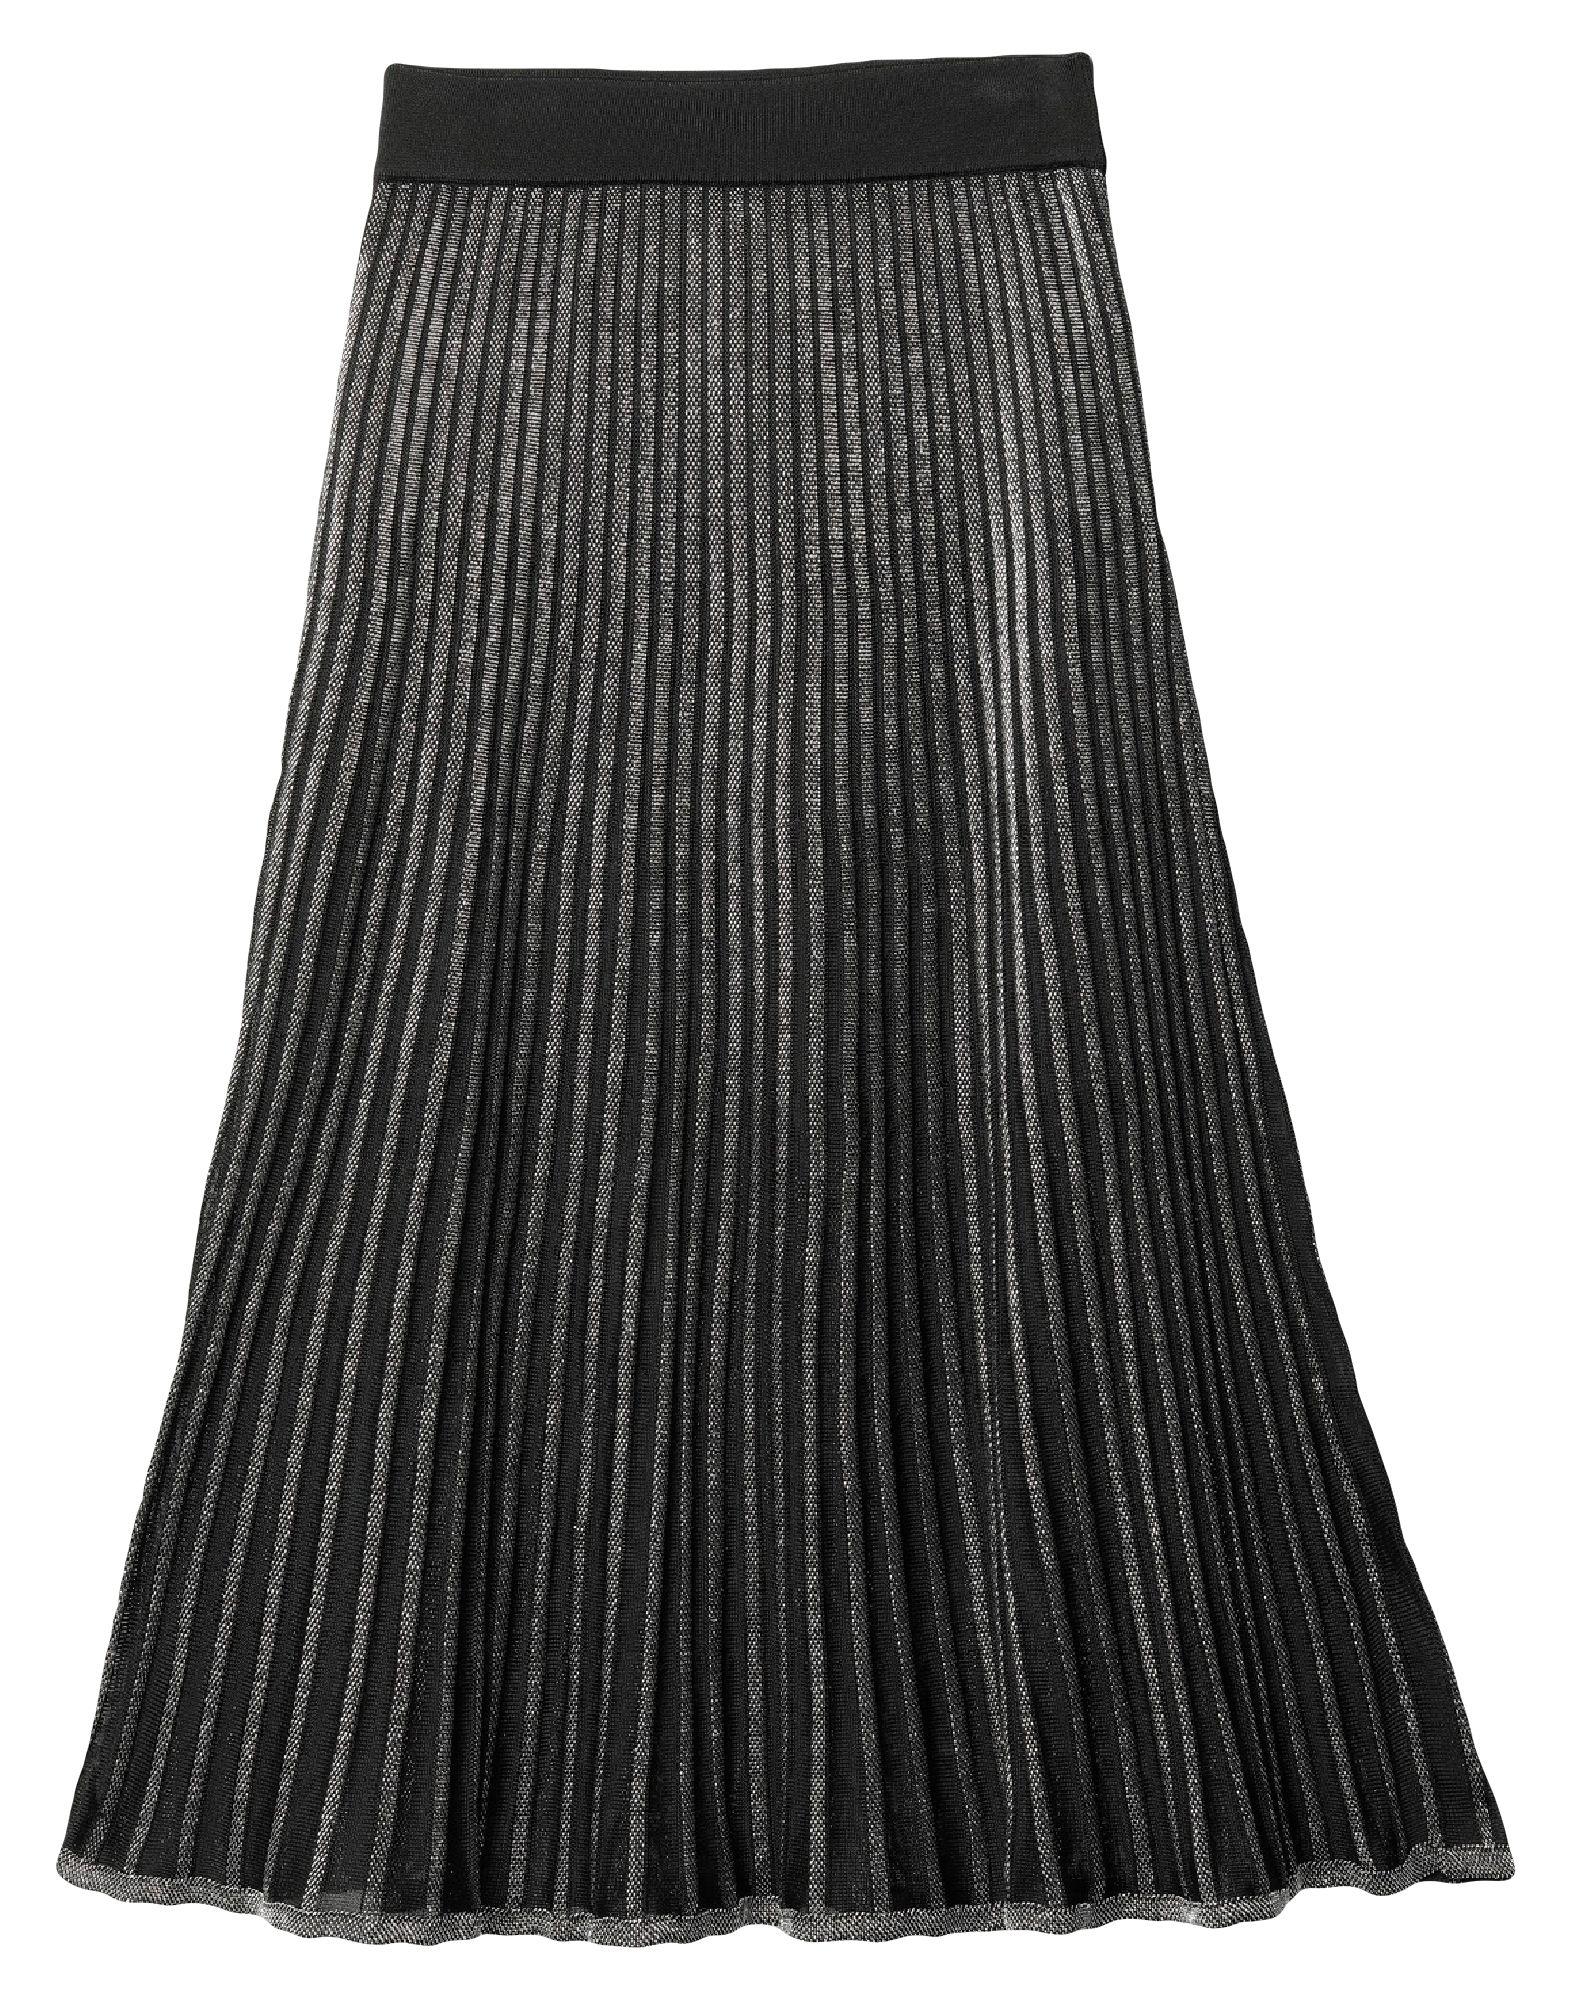 BALMAIN 3/4 length skirts. knitted, lamé, no appliqués, two-tone, no pockets, side closure, zipper closure, fully lined. 82% Viscose, 8% Metallic fiber, 6% Cotton, 2% Polyester, 2% Polyamide